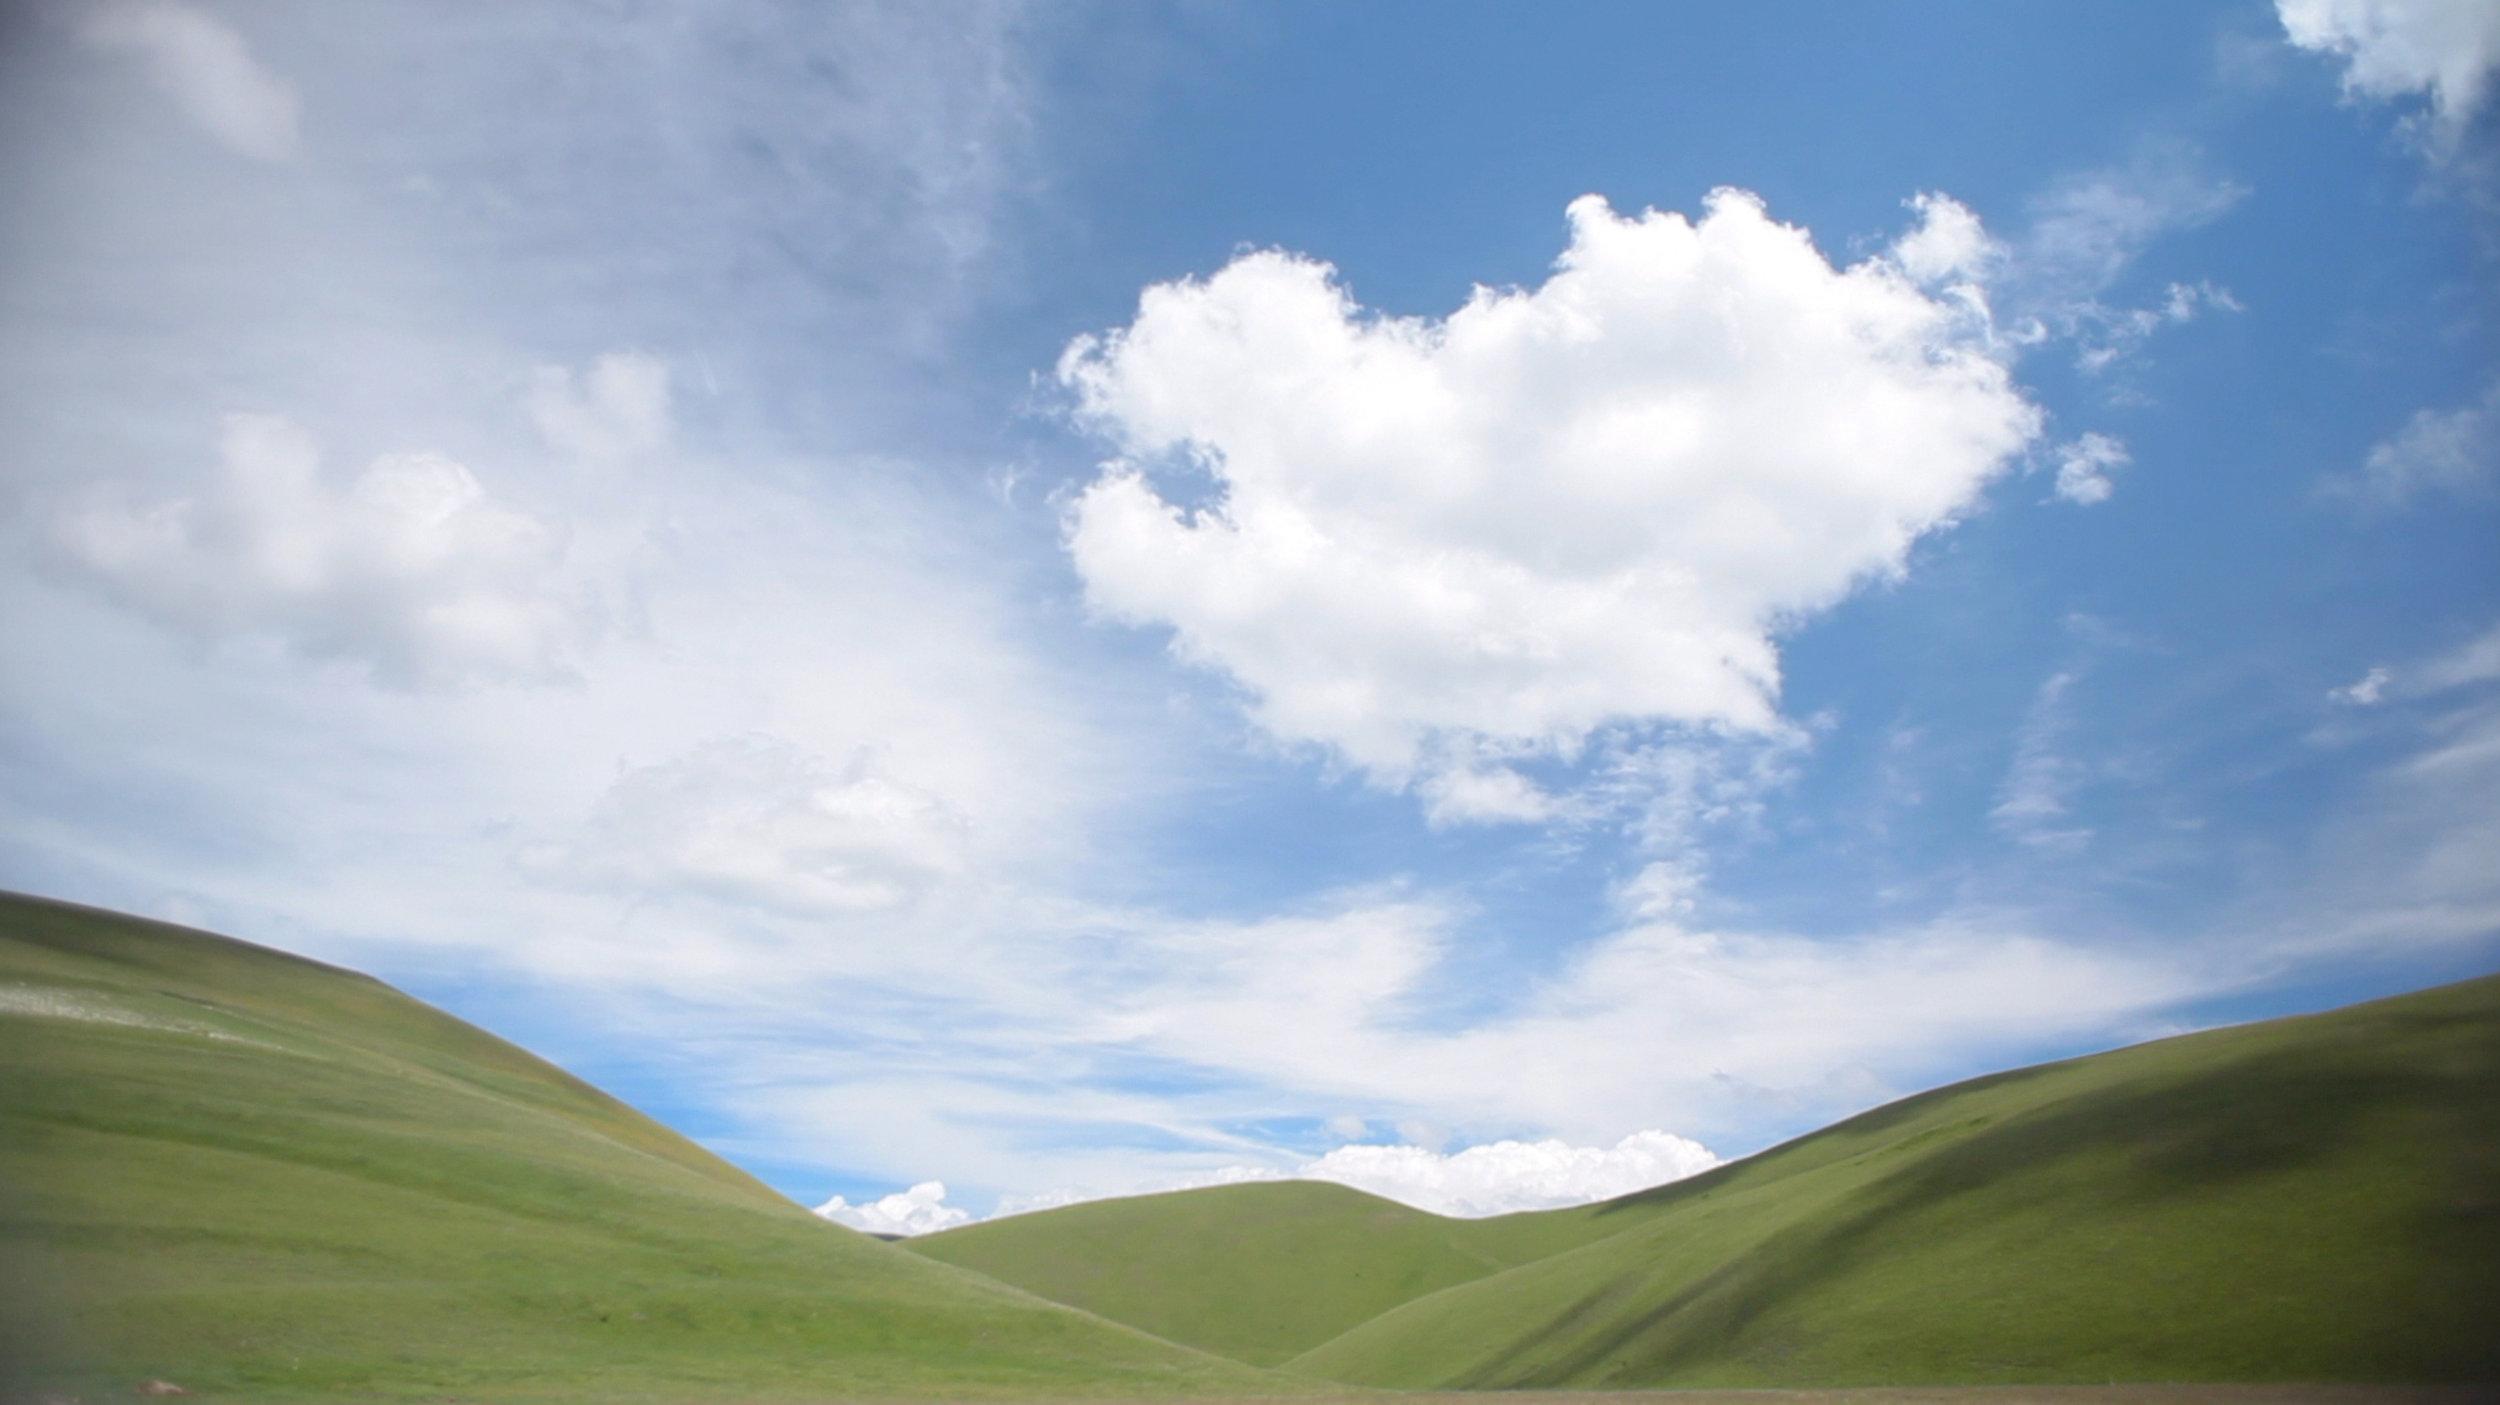 landscape 01.jpg